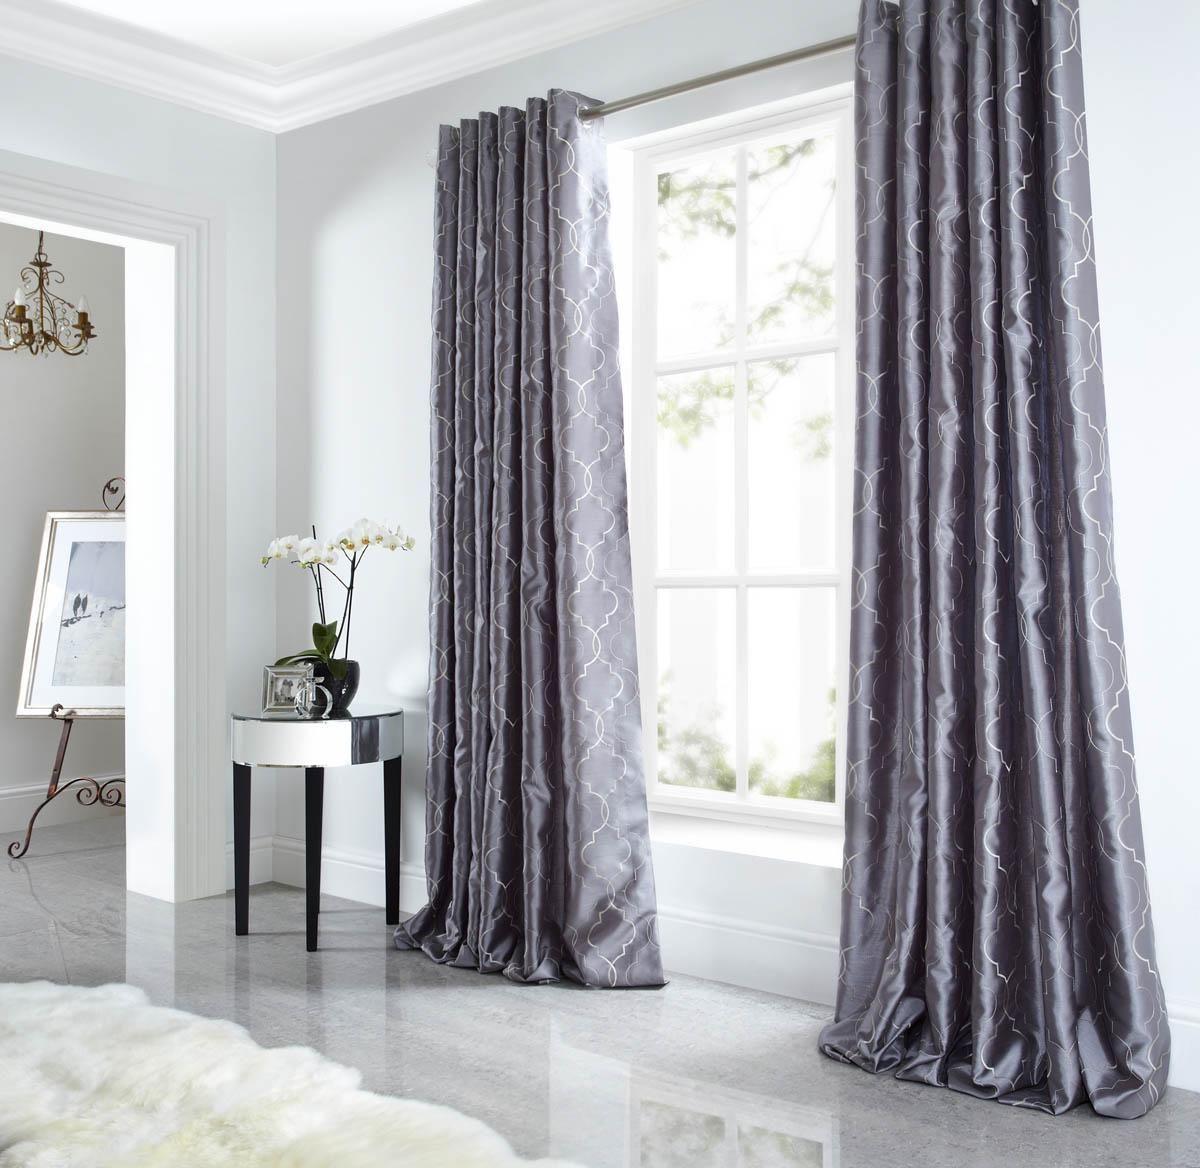 White Eyelet Bedroom Curtains Buy John Lewis Nazca Lined Eyelet Curtains Online At Large Size